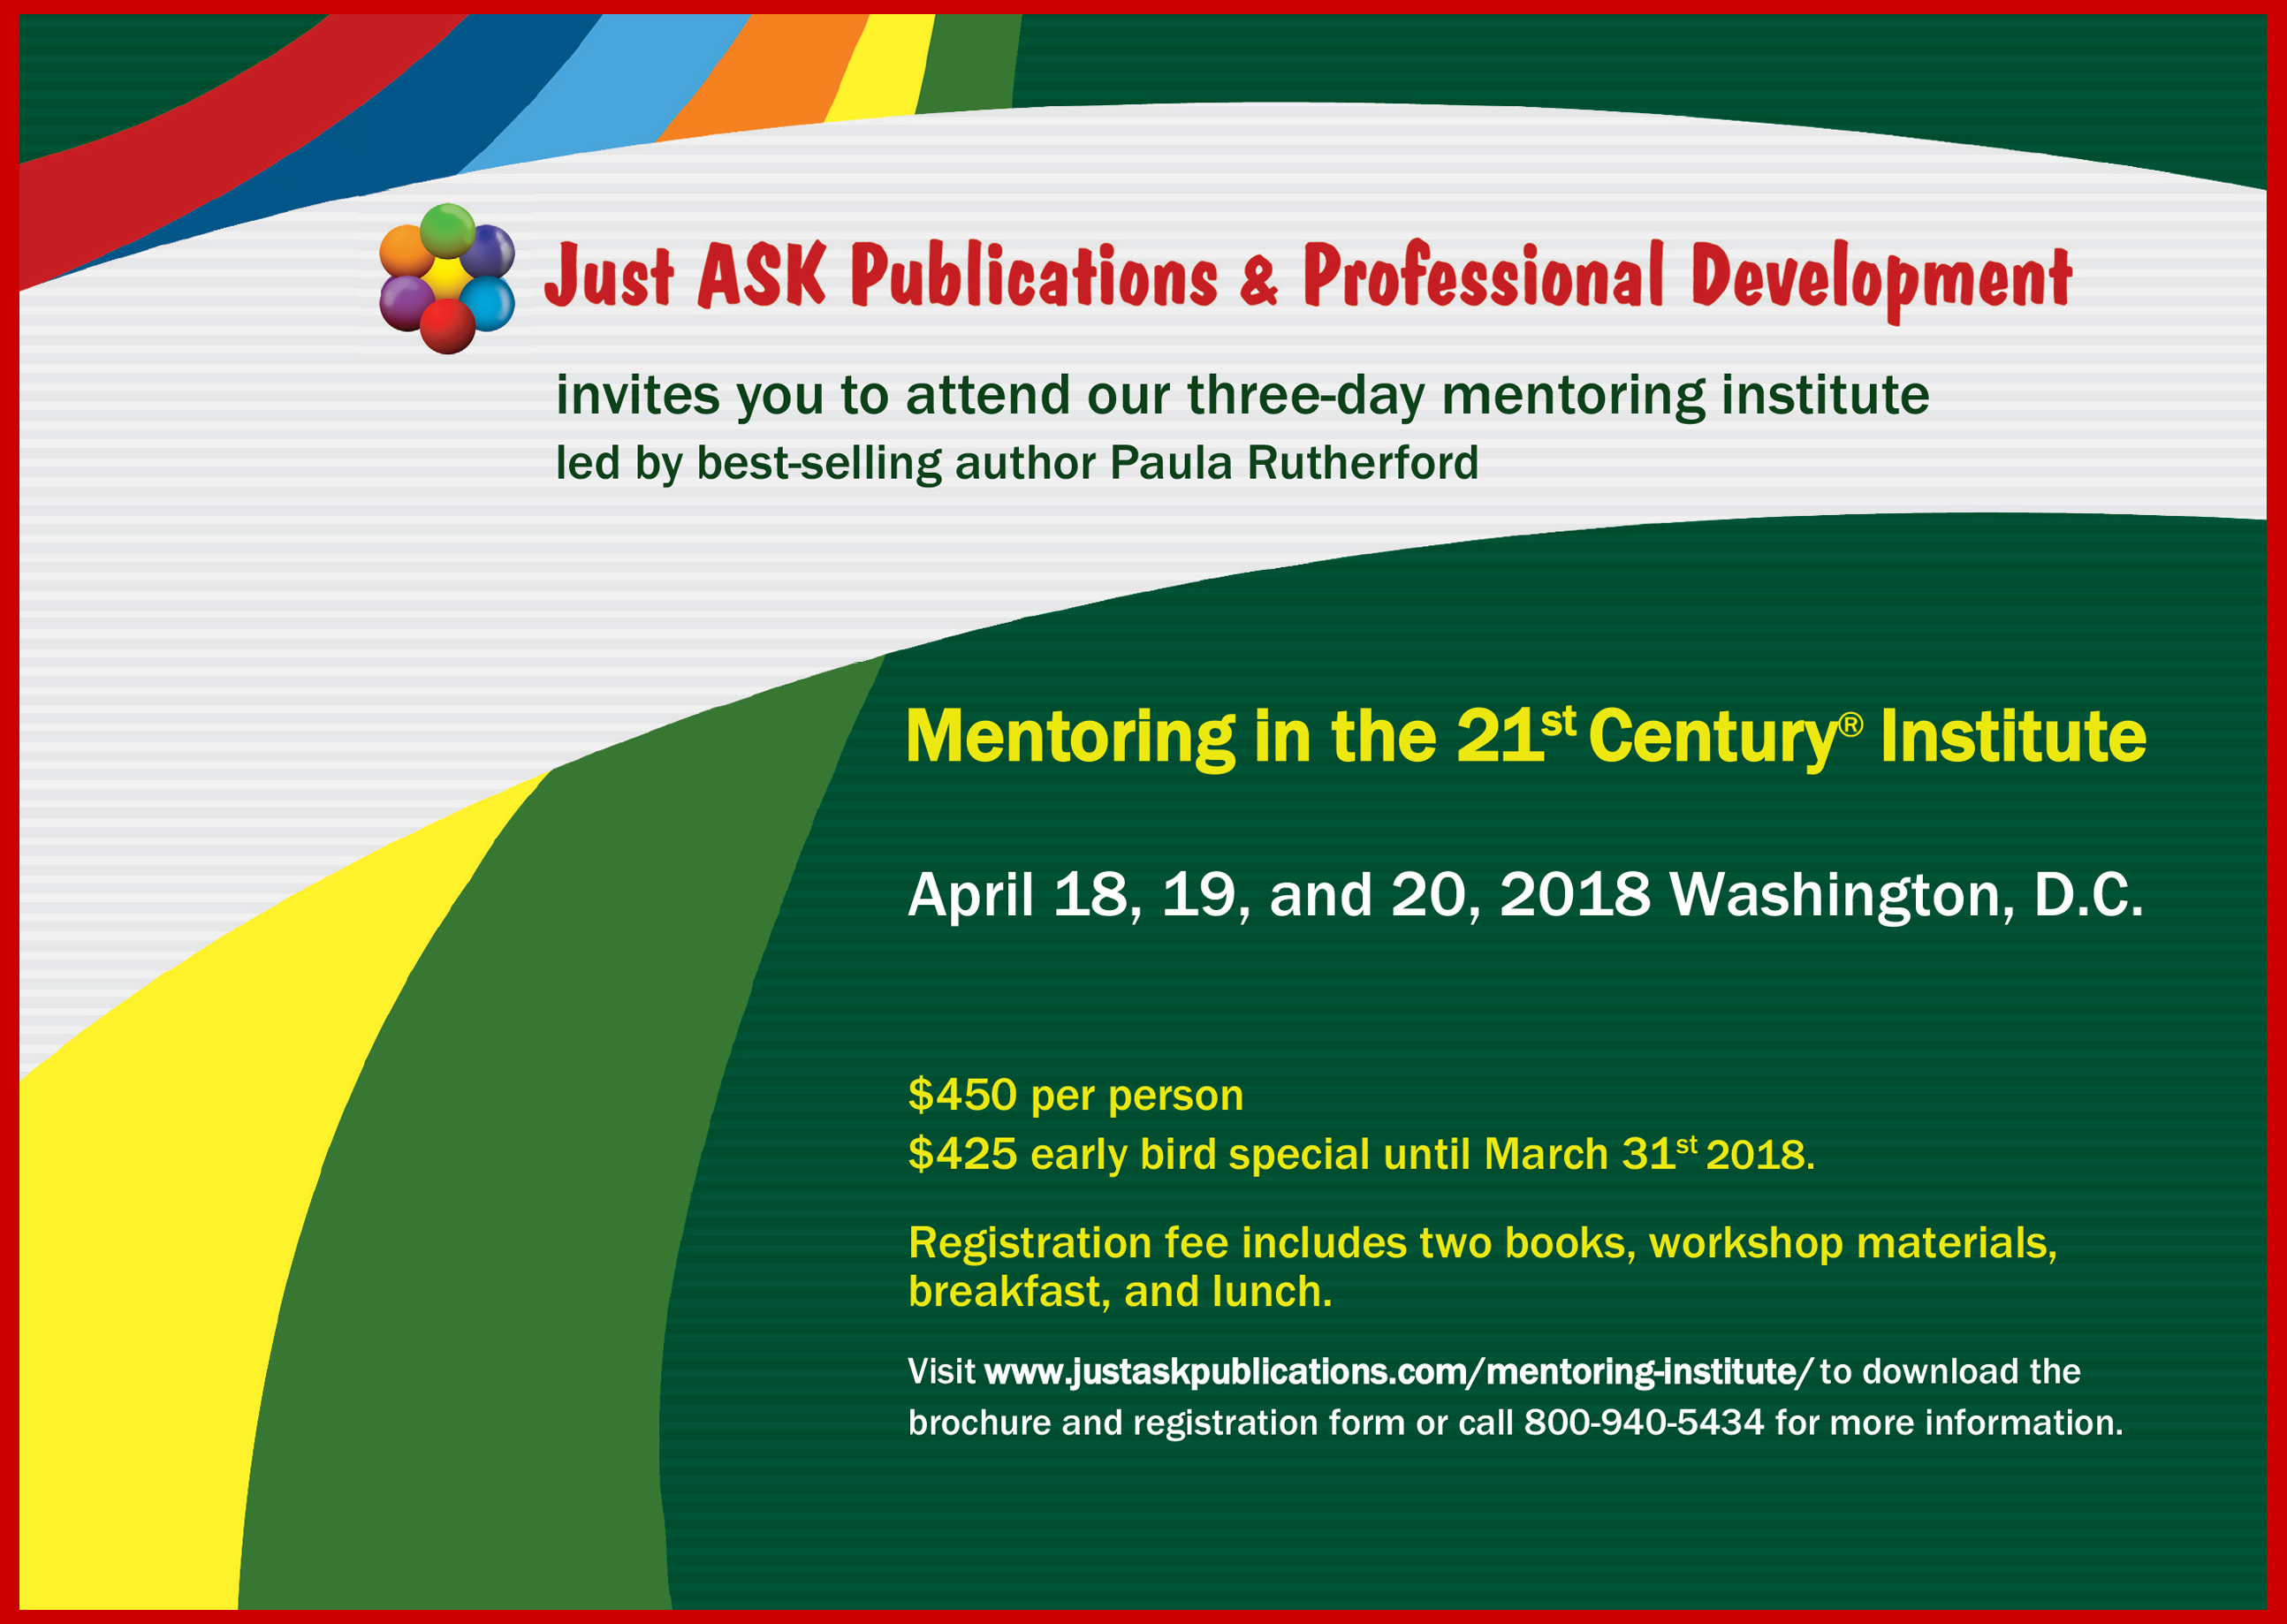 2018 Mentoring in the 21st Century Institute